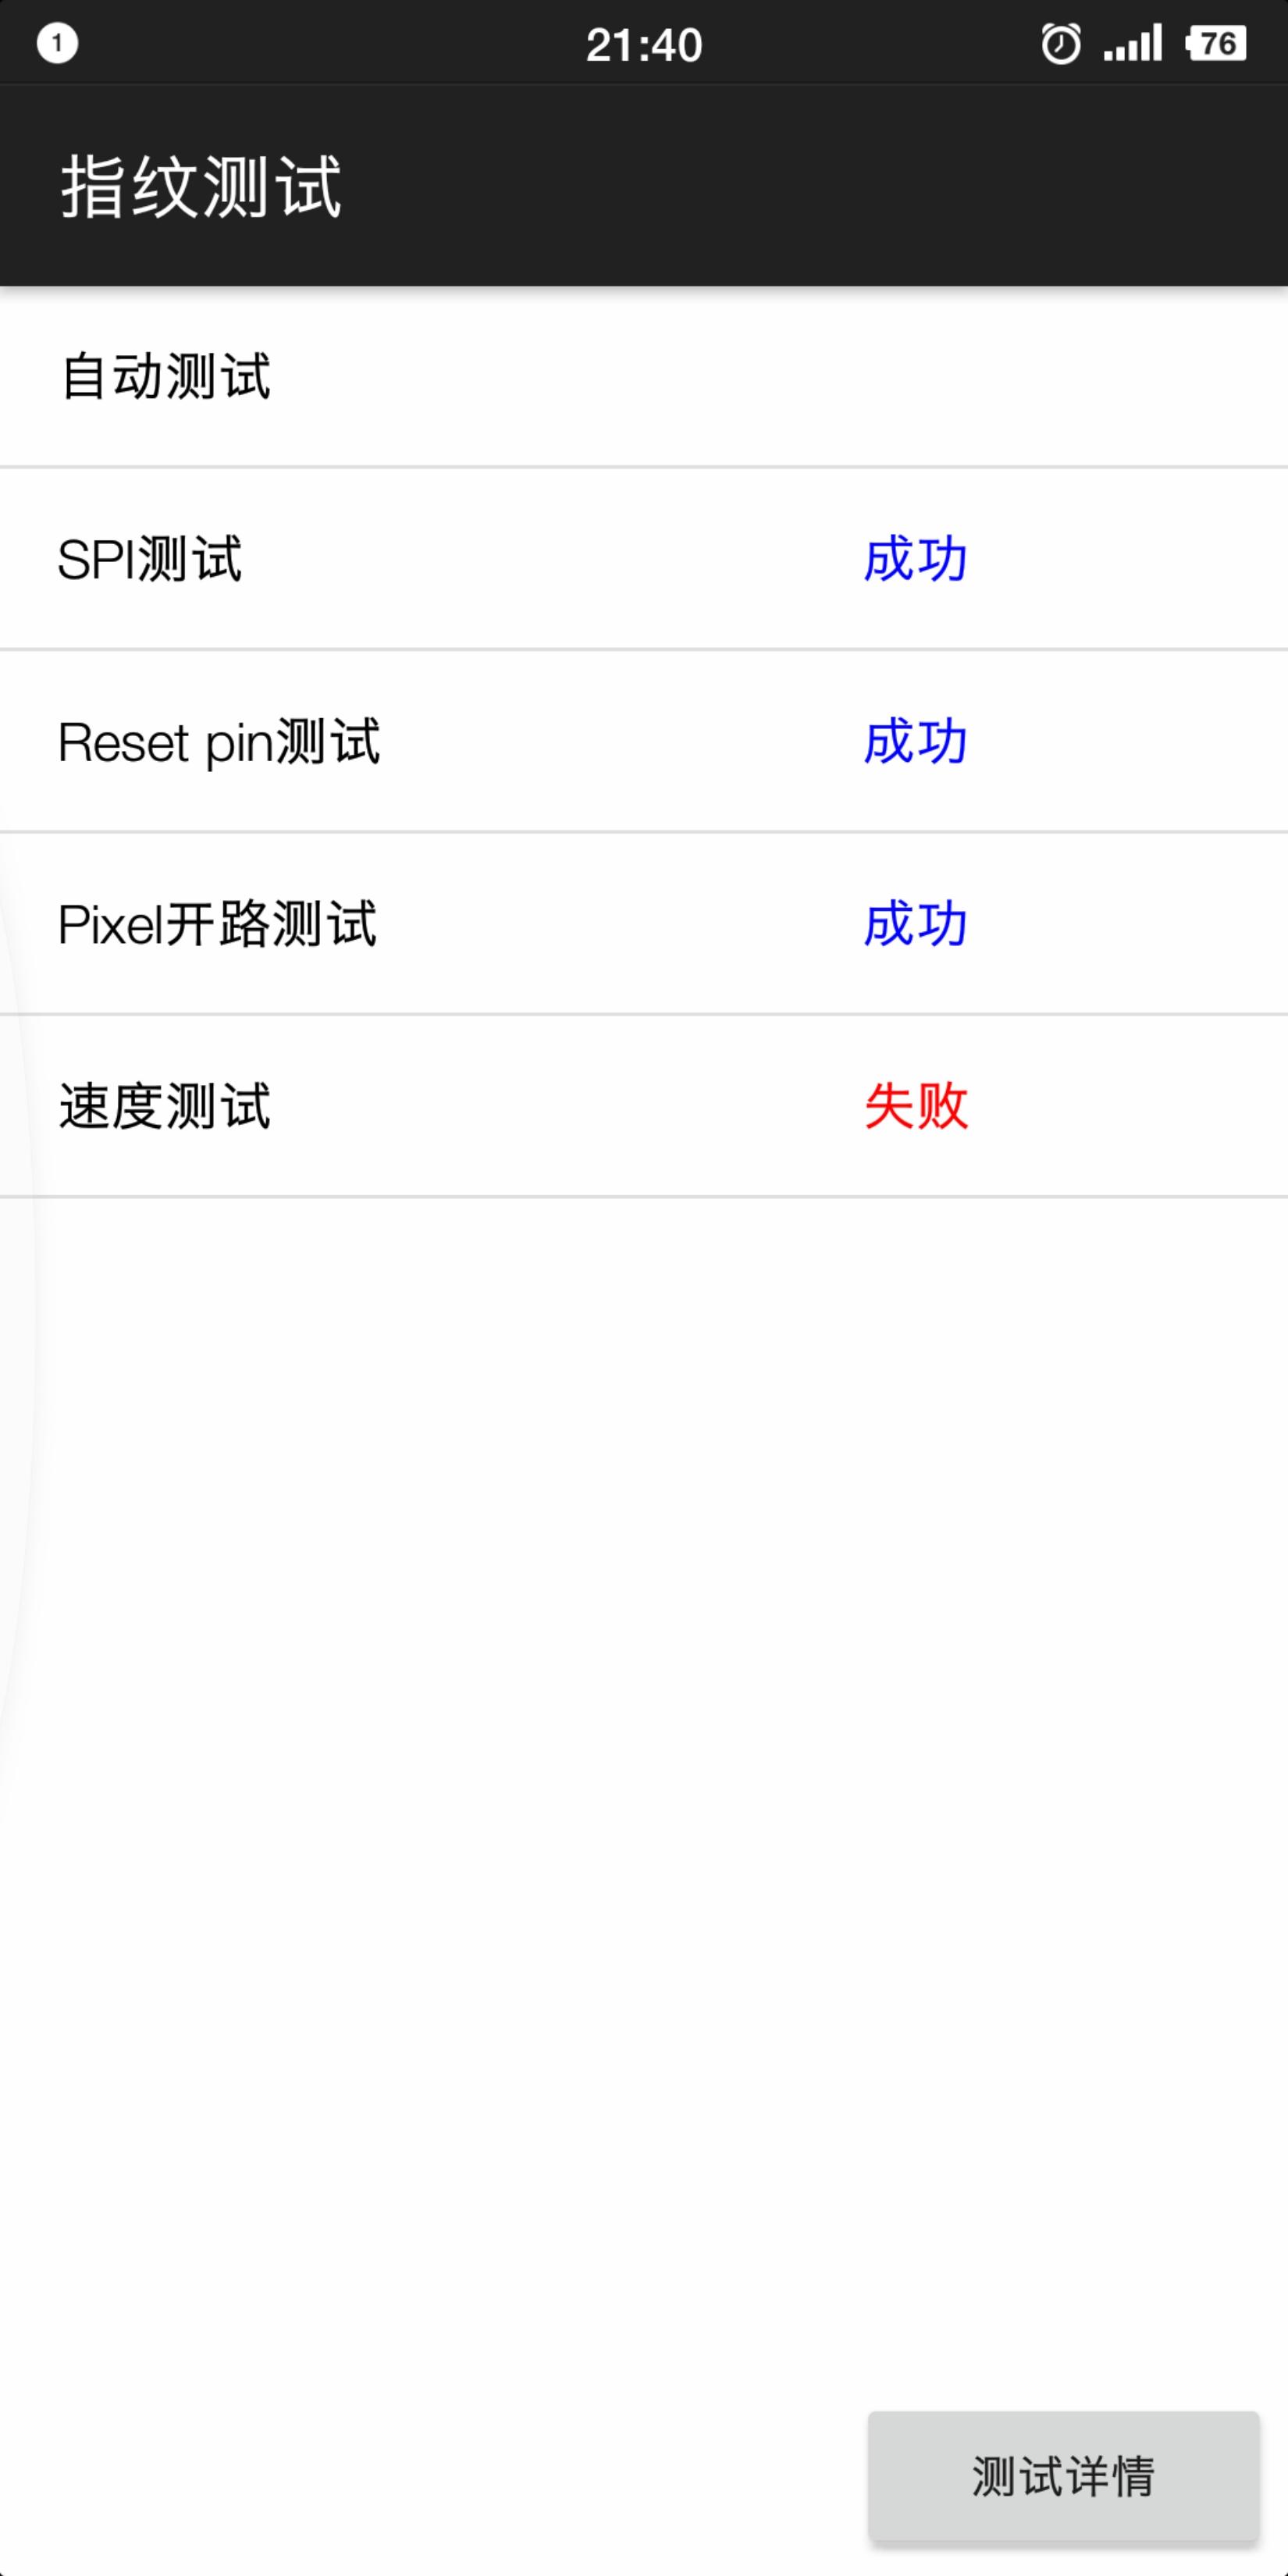 Screenshot_2019-10-18-21-40-47-068_MM1.png